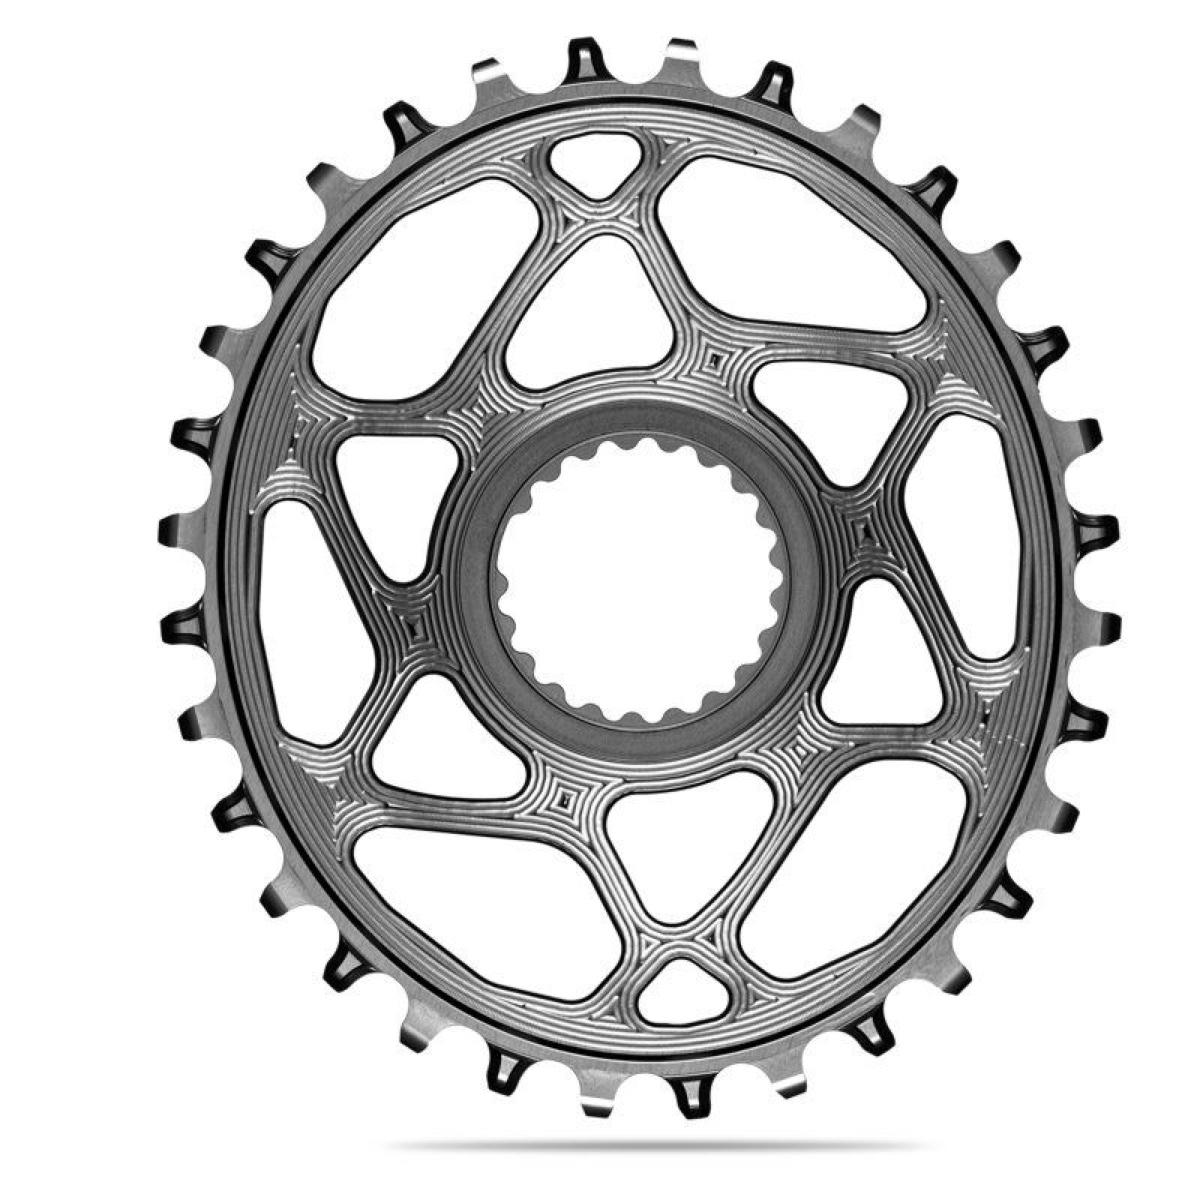 AbsoluteBlack Klinge NW Shimano 12 speed OVAL - Grå - SHDMOVxxGR | chainrings_component